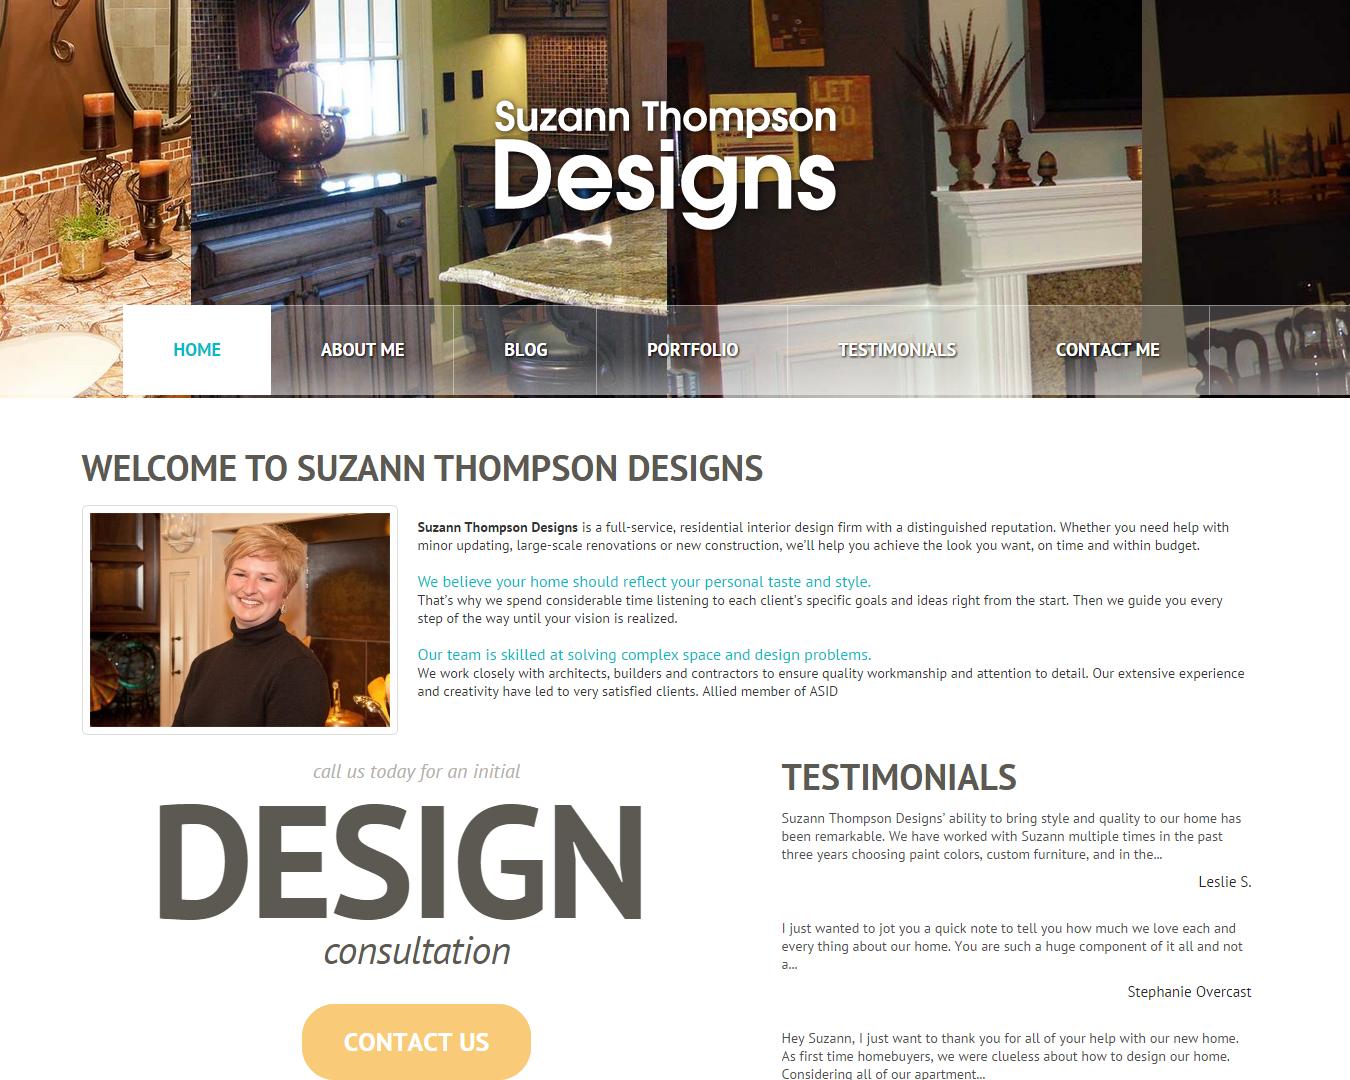 Suzann Thompson Designs